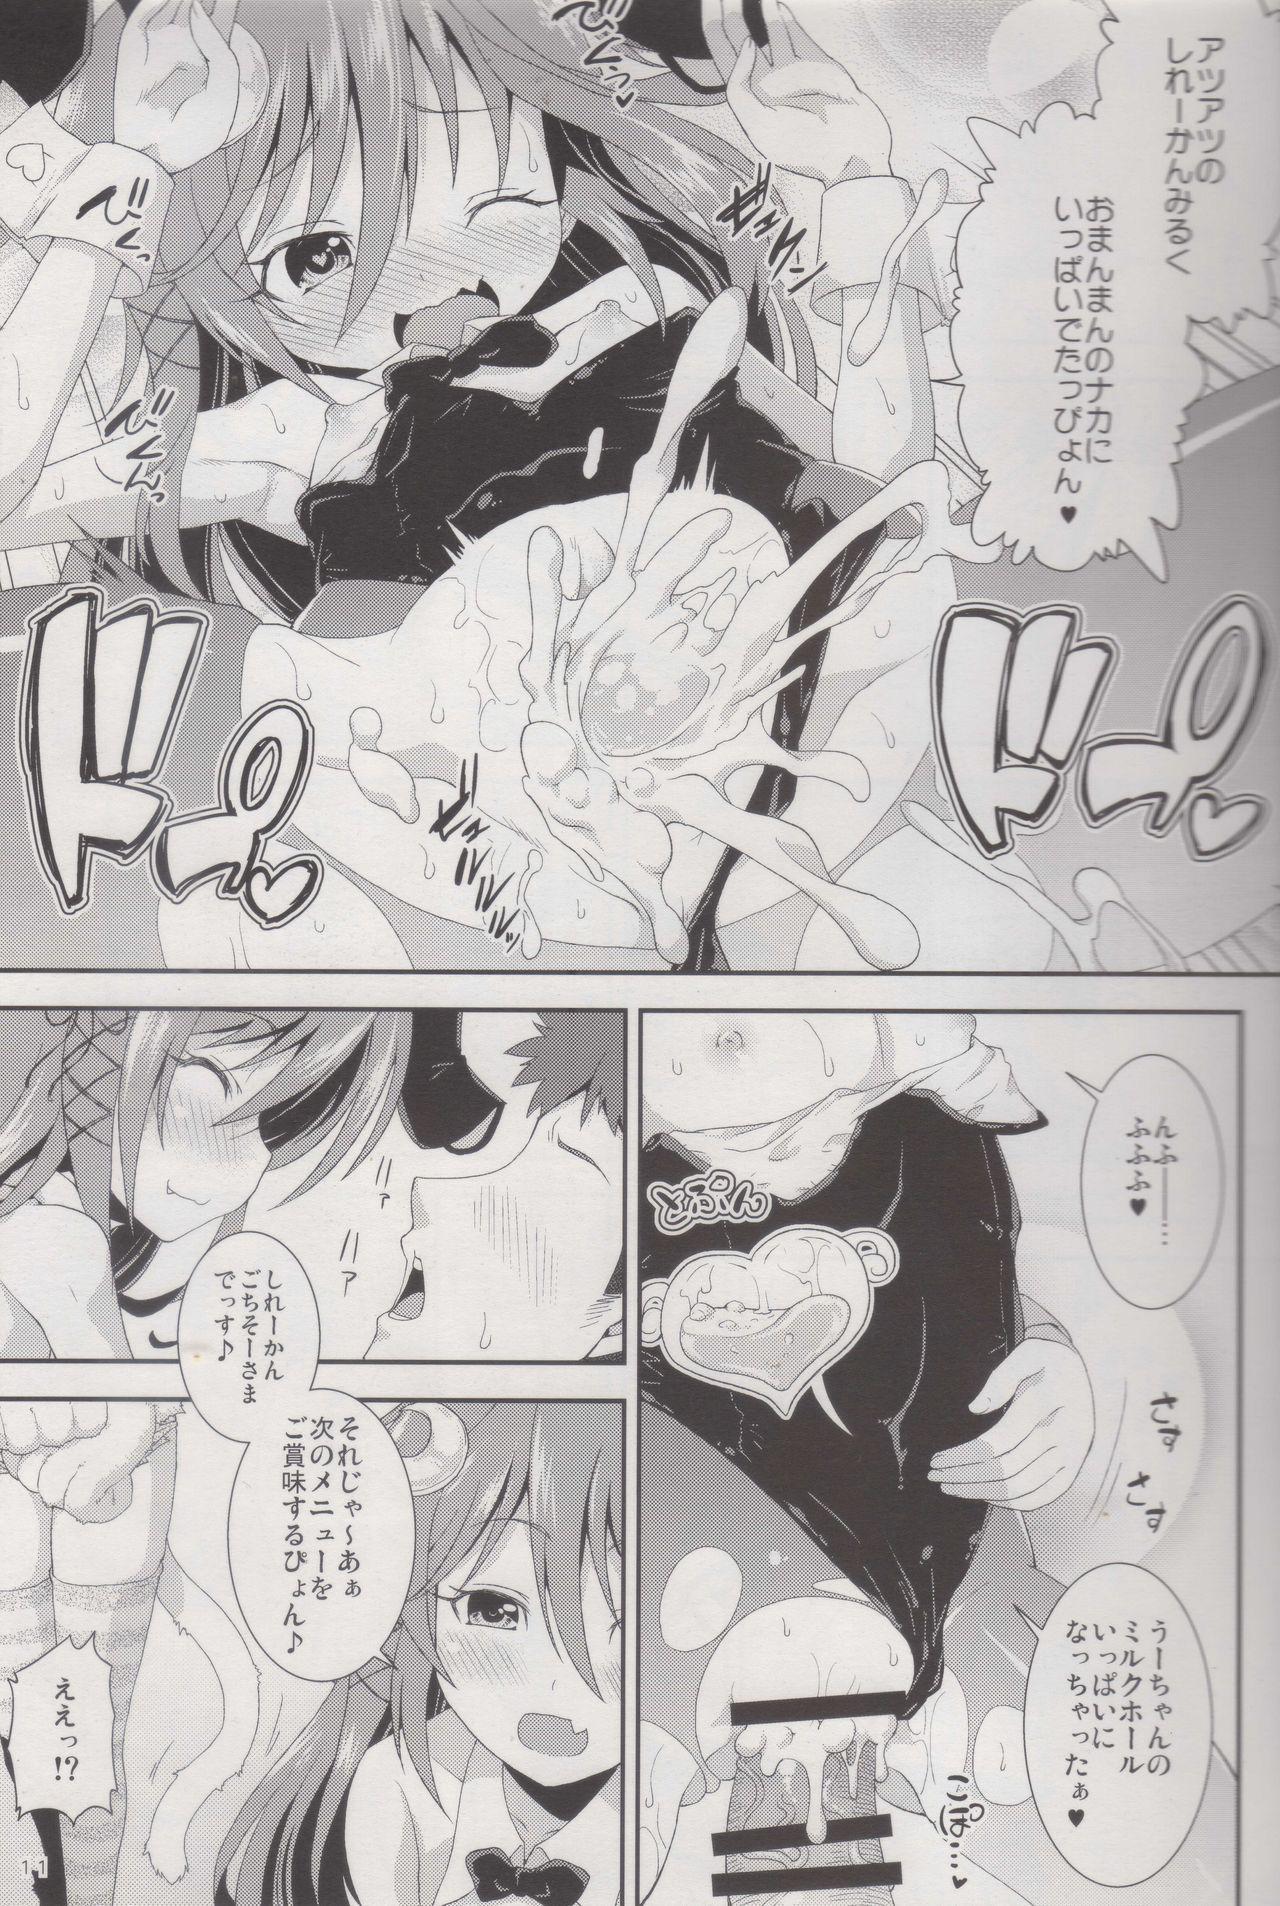 (C90) [Igou (Yamazaki Kana)] Let's U-! Ya-! (Kantai Collection -KanColle-) 9